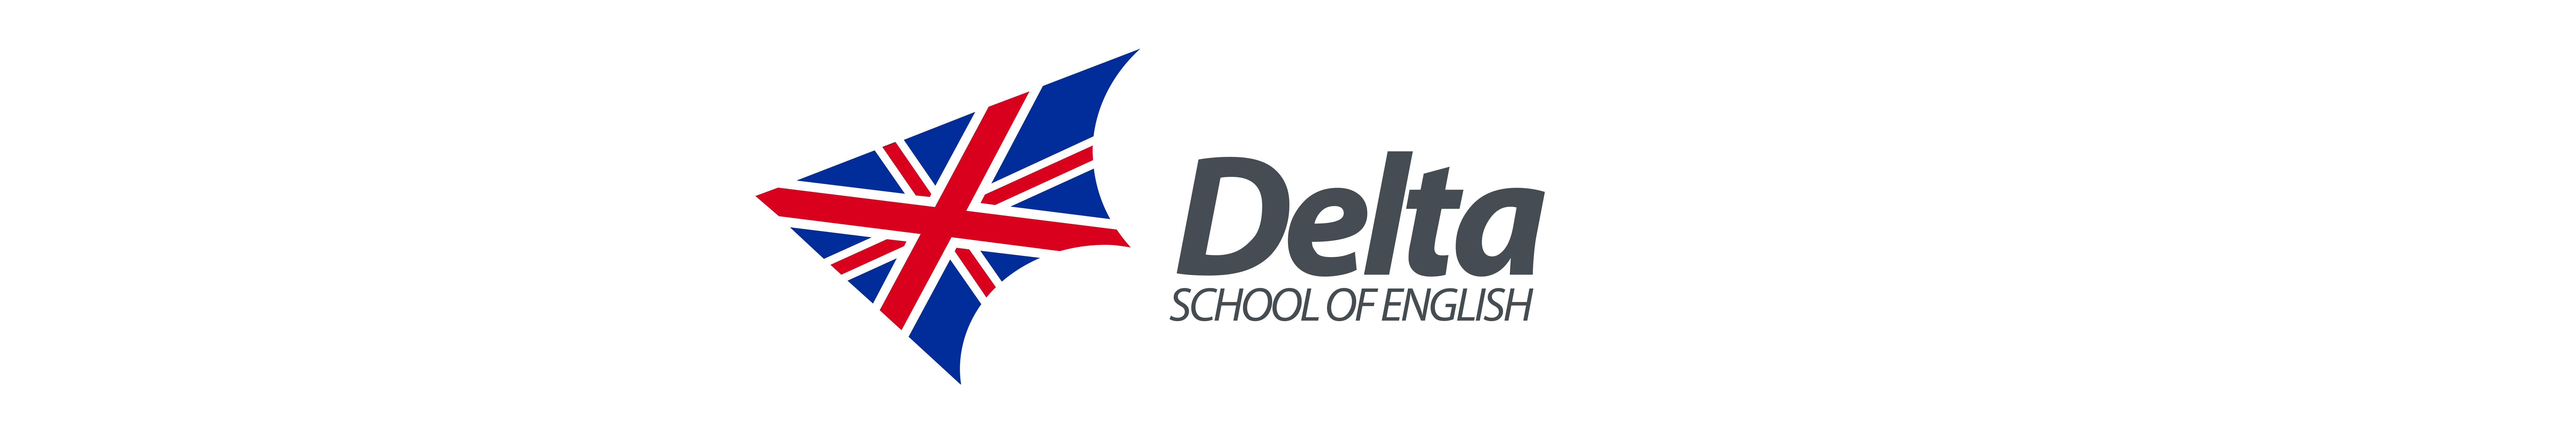 Delta School of English